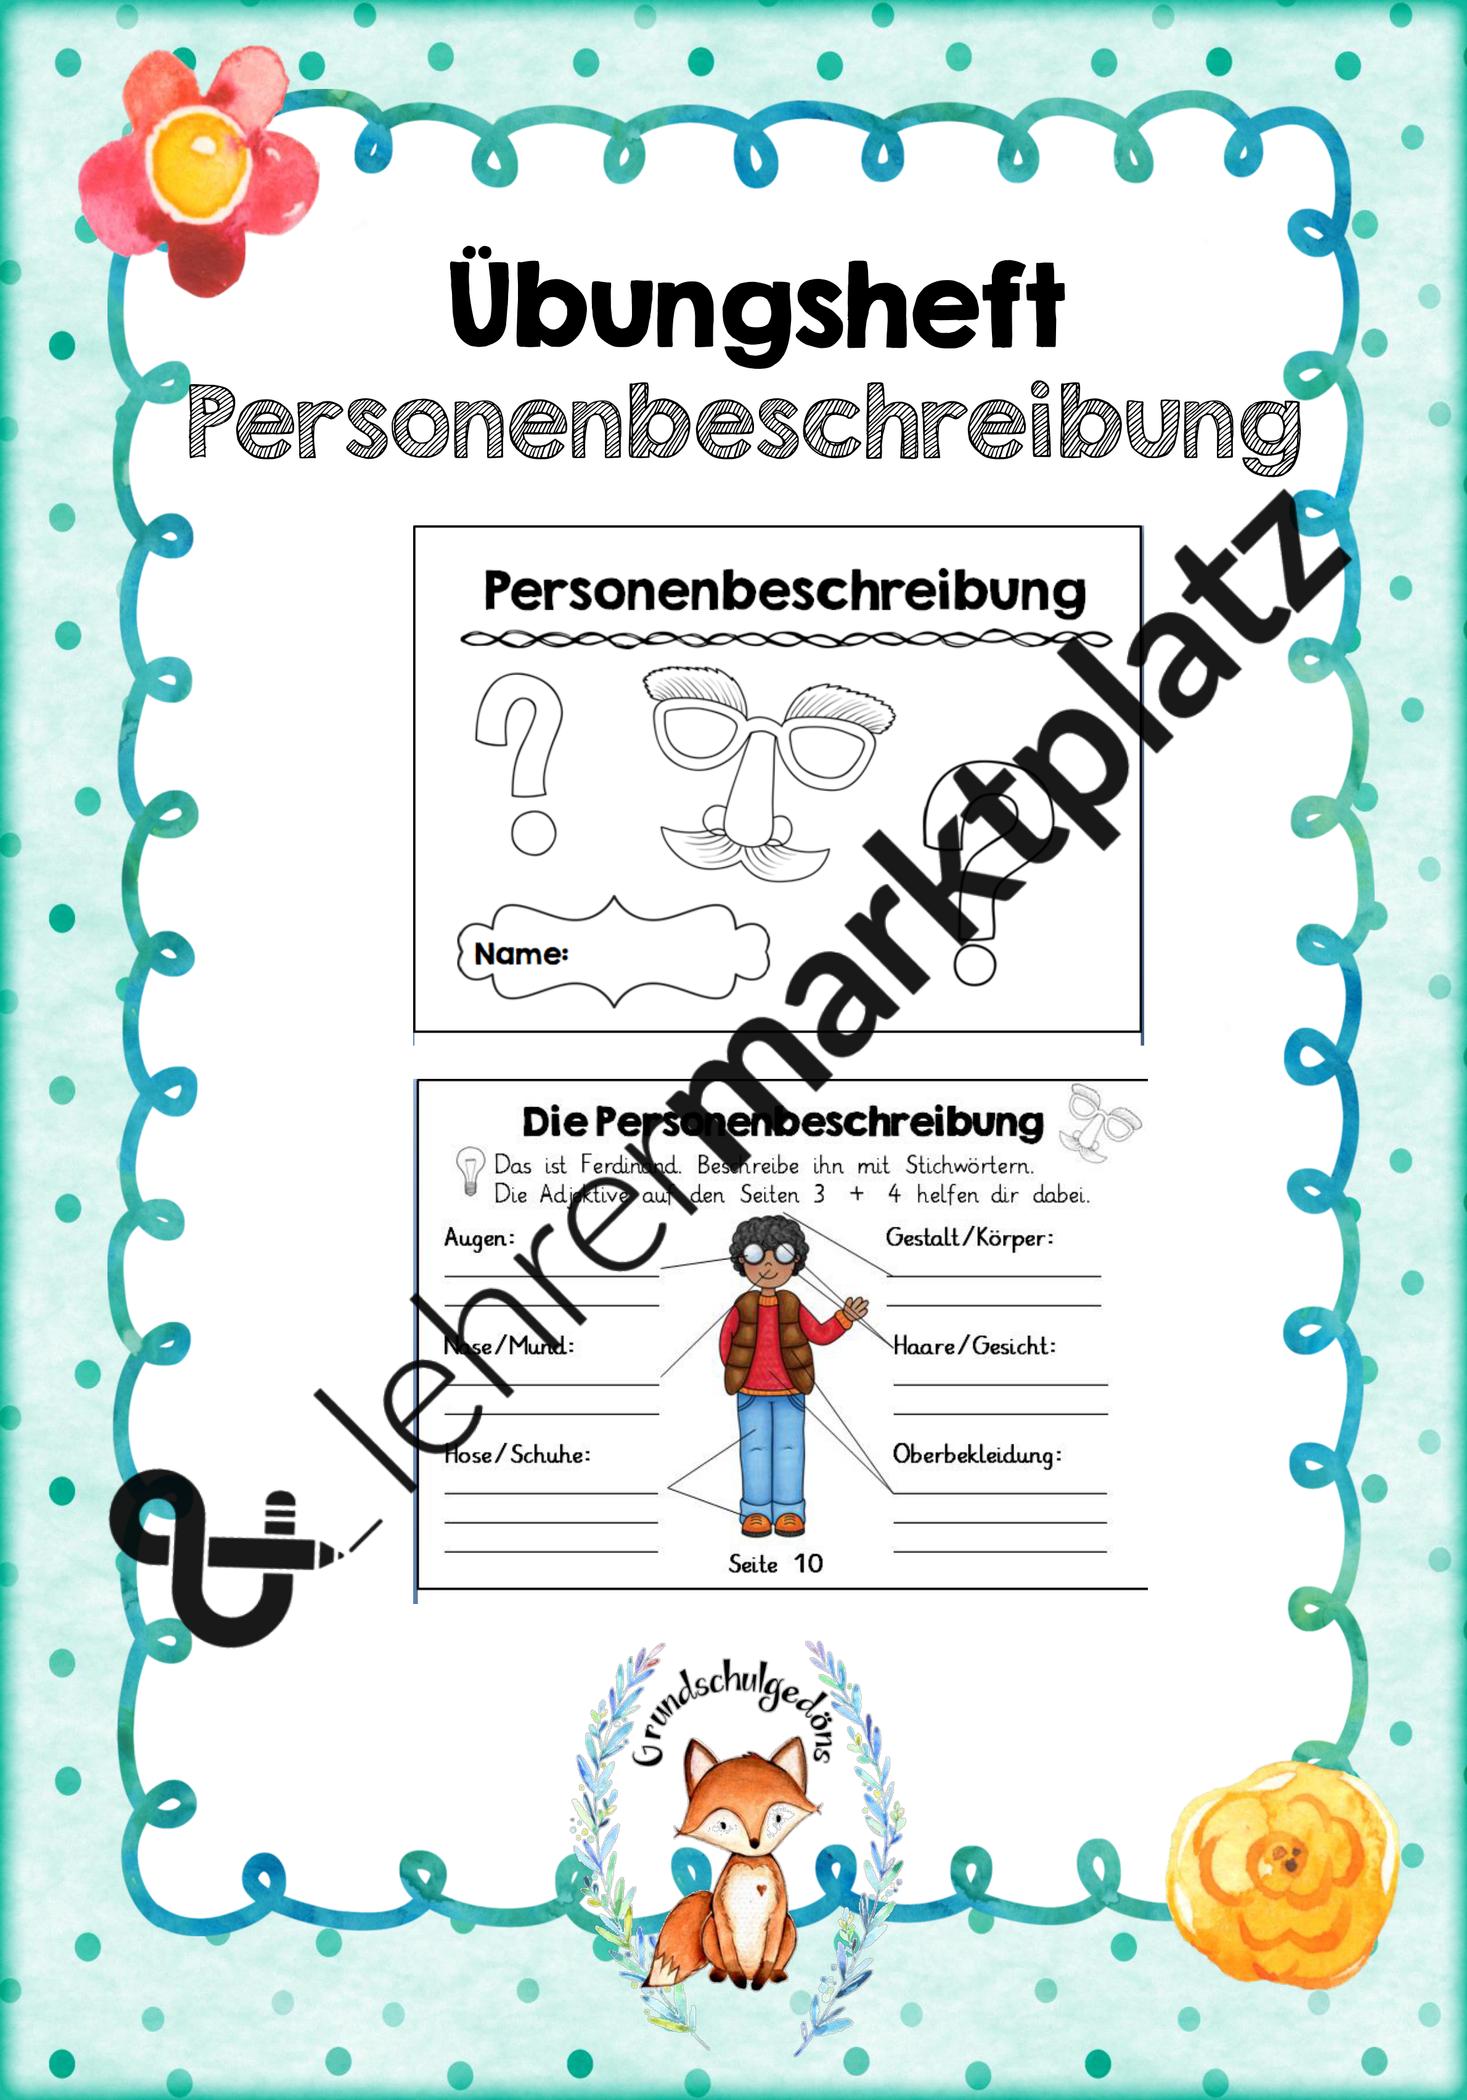 Heft Personenbeschreibung Unterrichtsmaterial Im Fach Deutsch Personenbeschreibung Unterrichtsmaterial Personenbeschreibung Grundschule